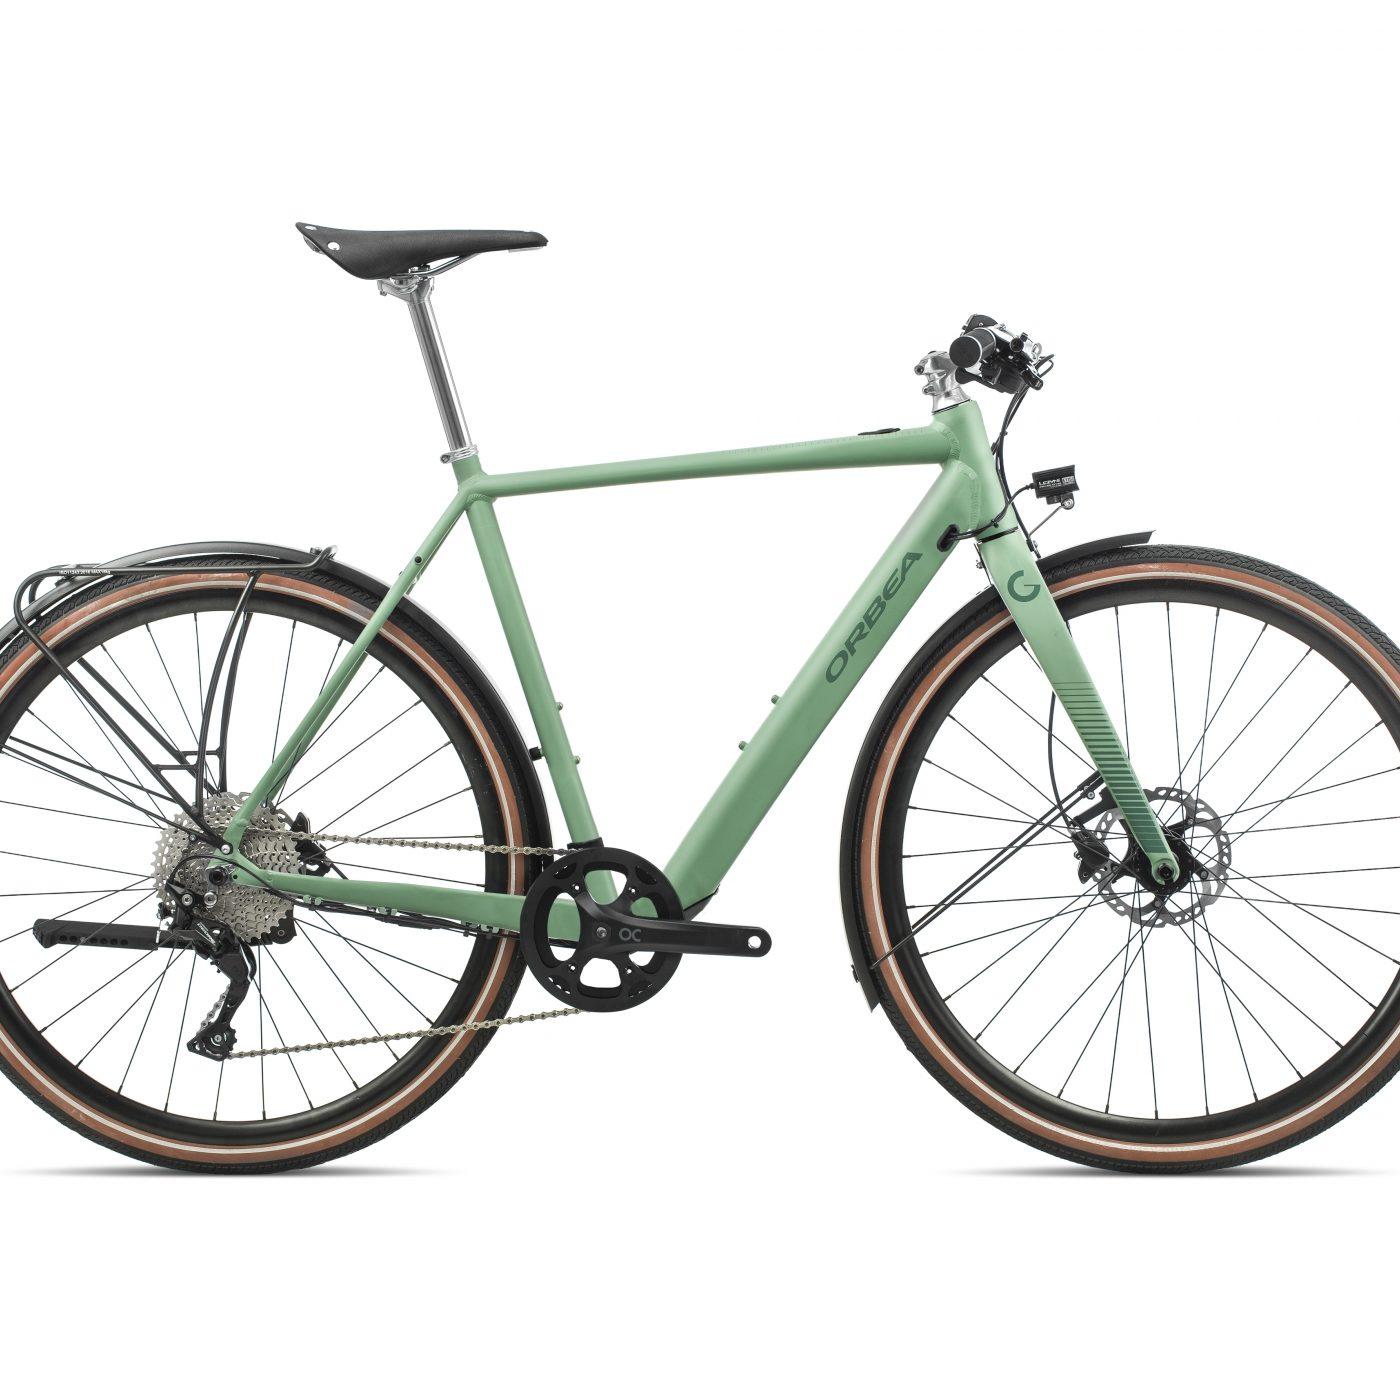 Orbea Gain F10 - Groen (Dof-Gloss)